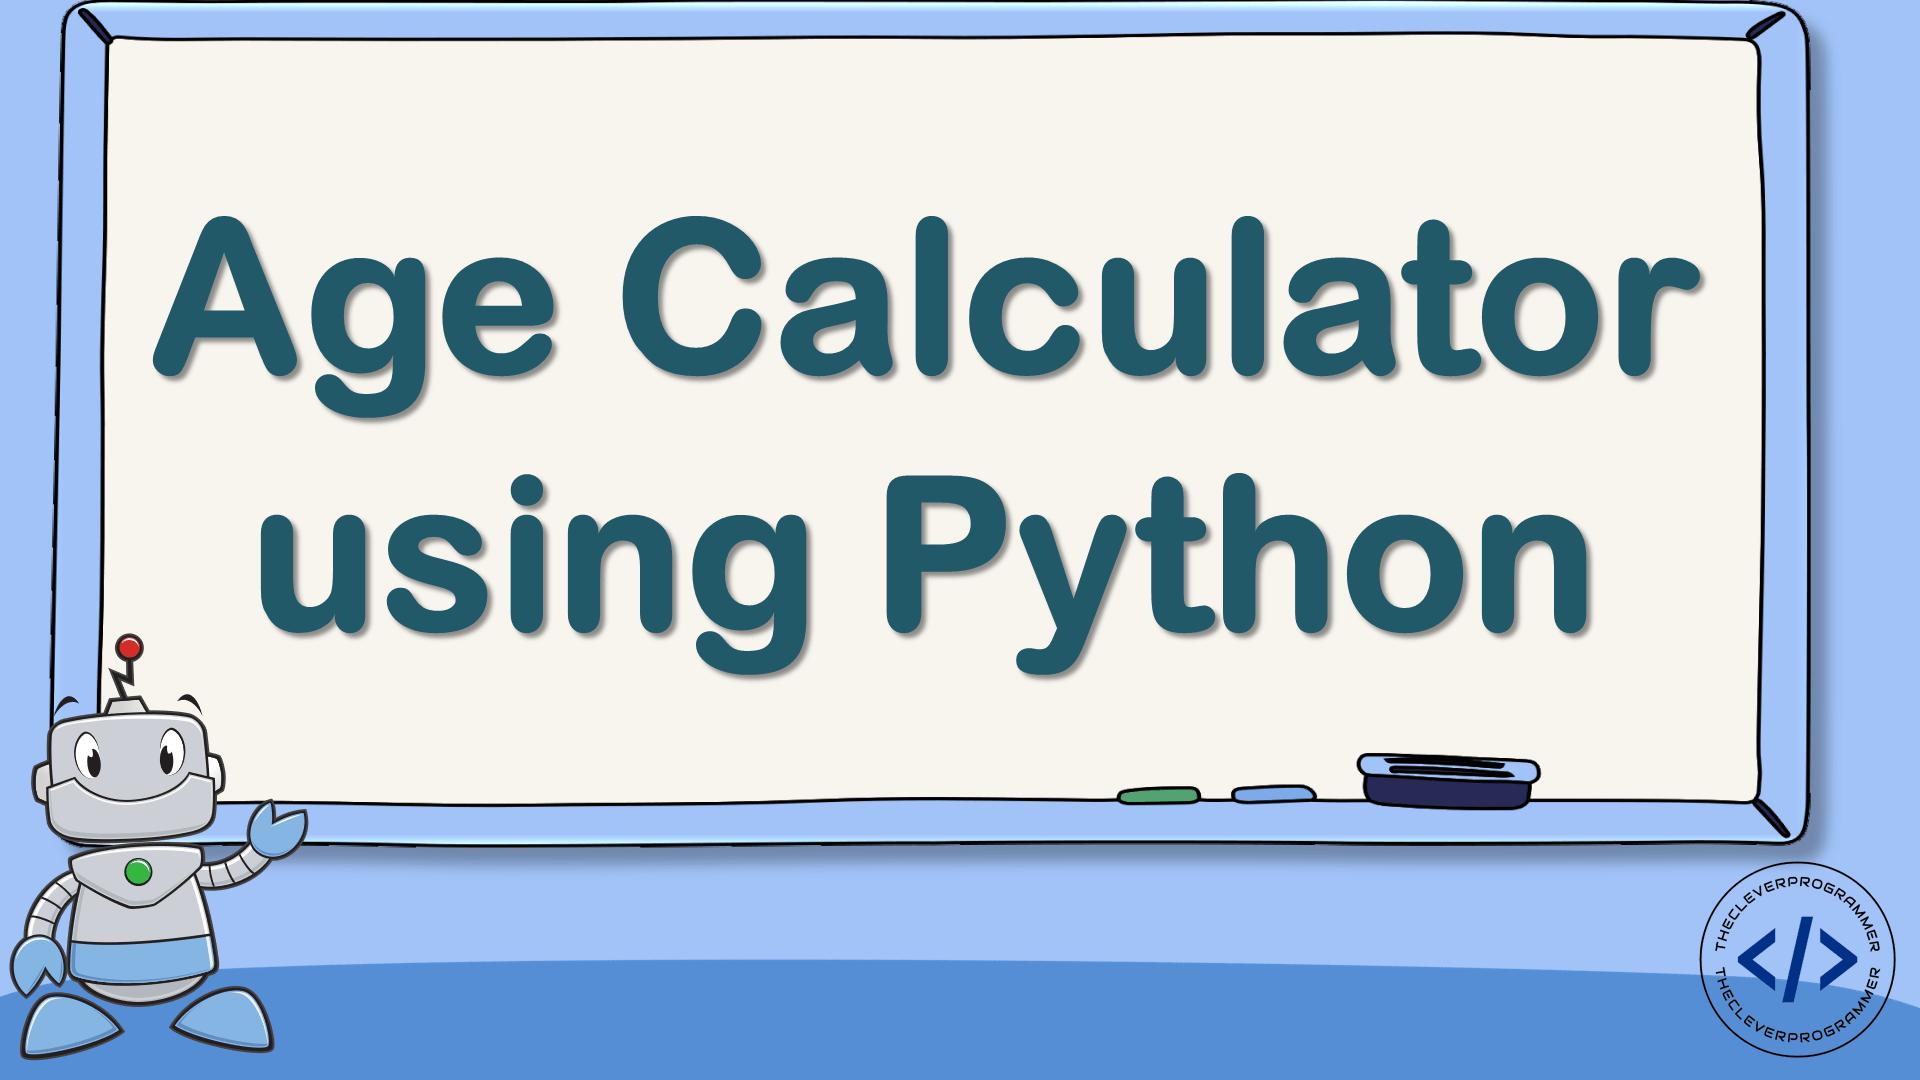 Age Calculator using Python